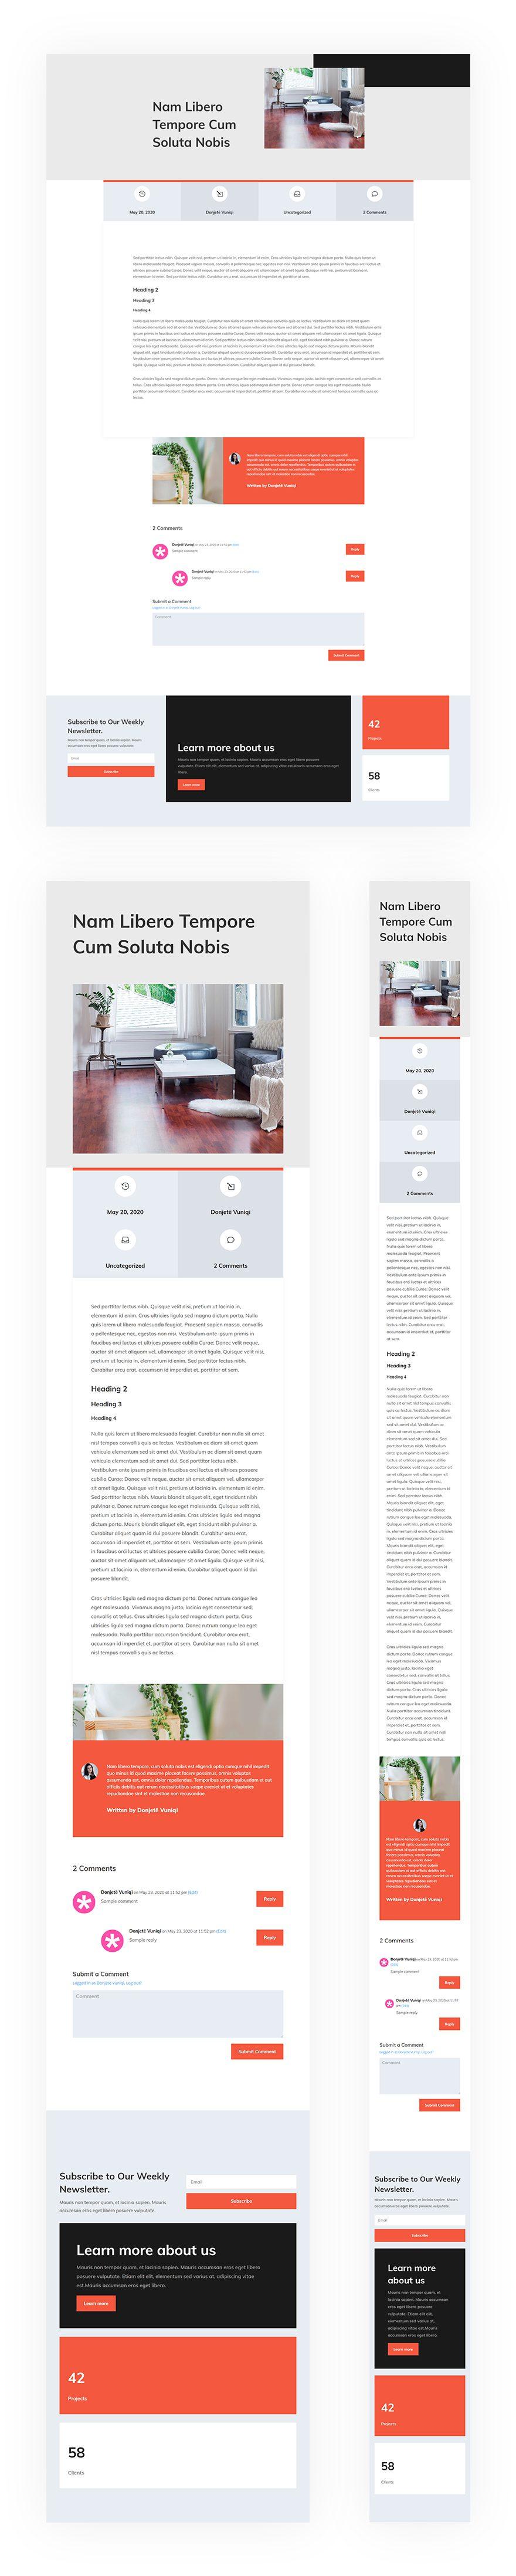 interior design blog post template